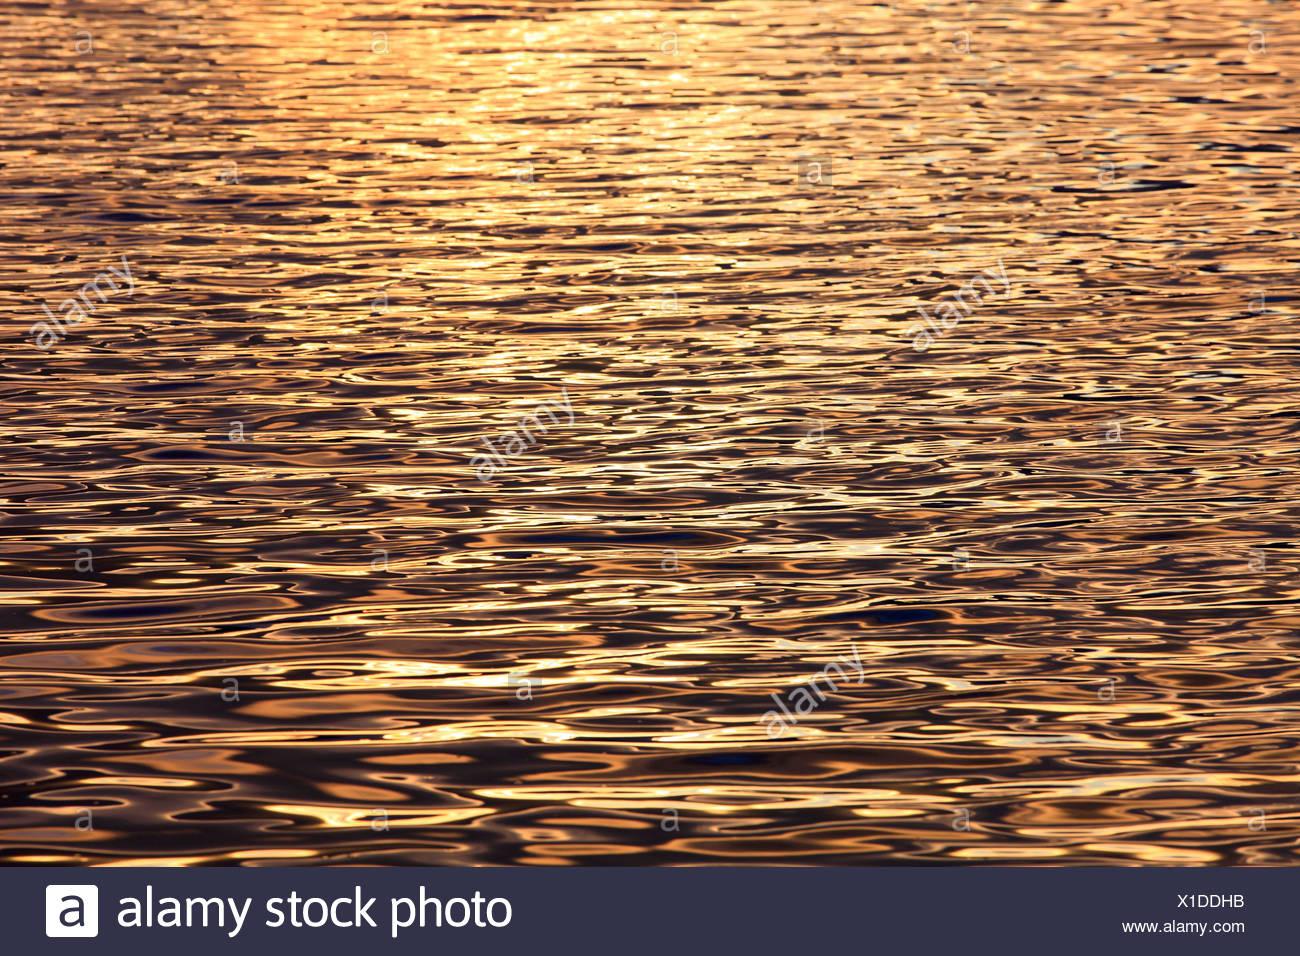 Evening, evening light, Cairngorms, detail, graphical, highlands, highland, Loch, Loch Morlich, Morlich, national park, park, re - Stock Image